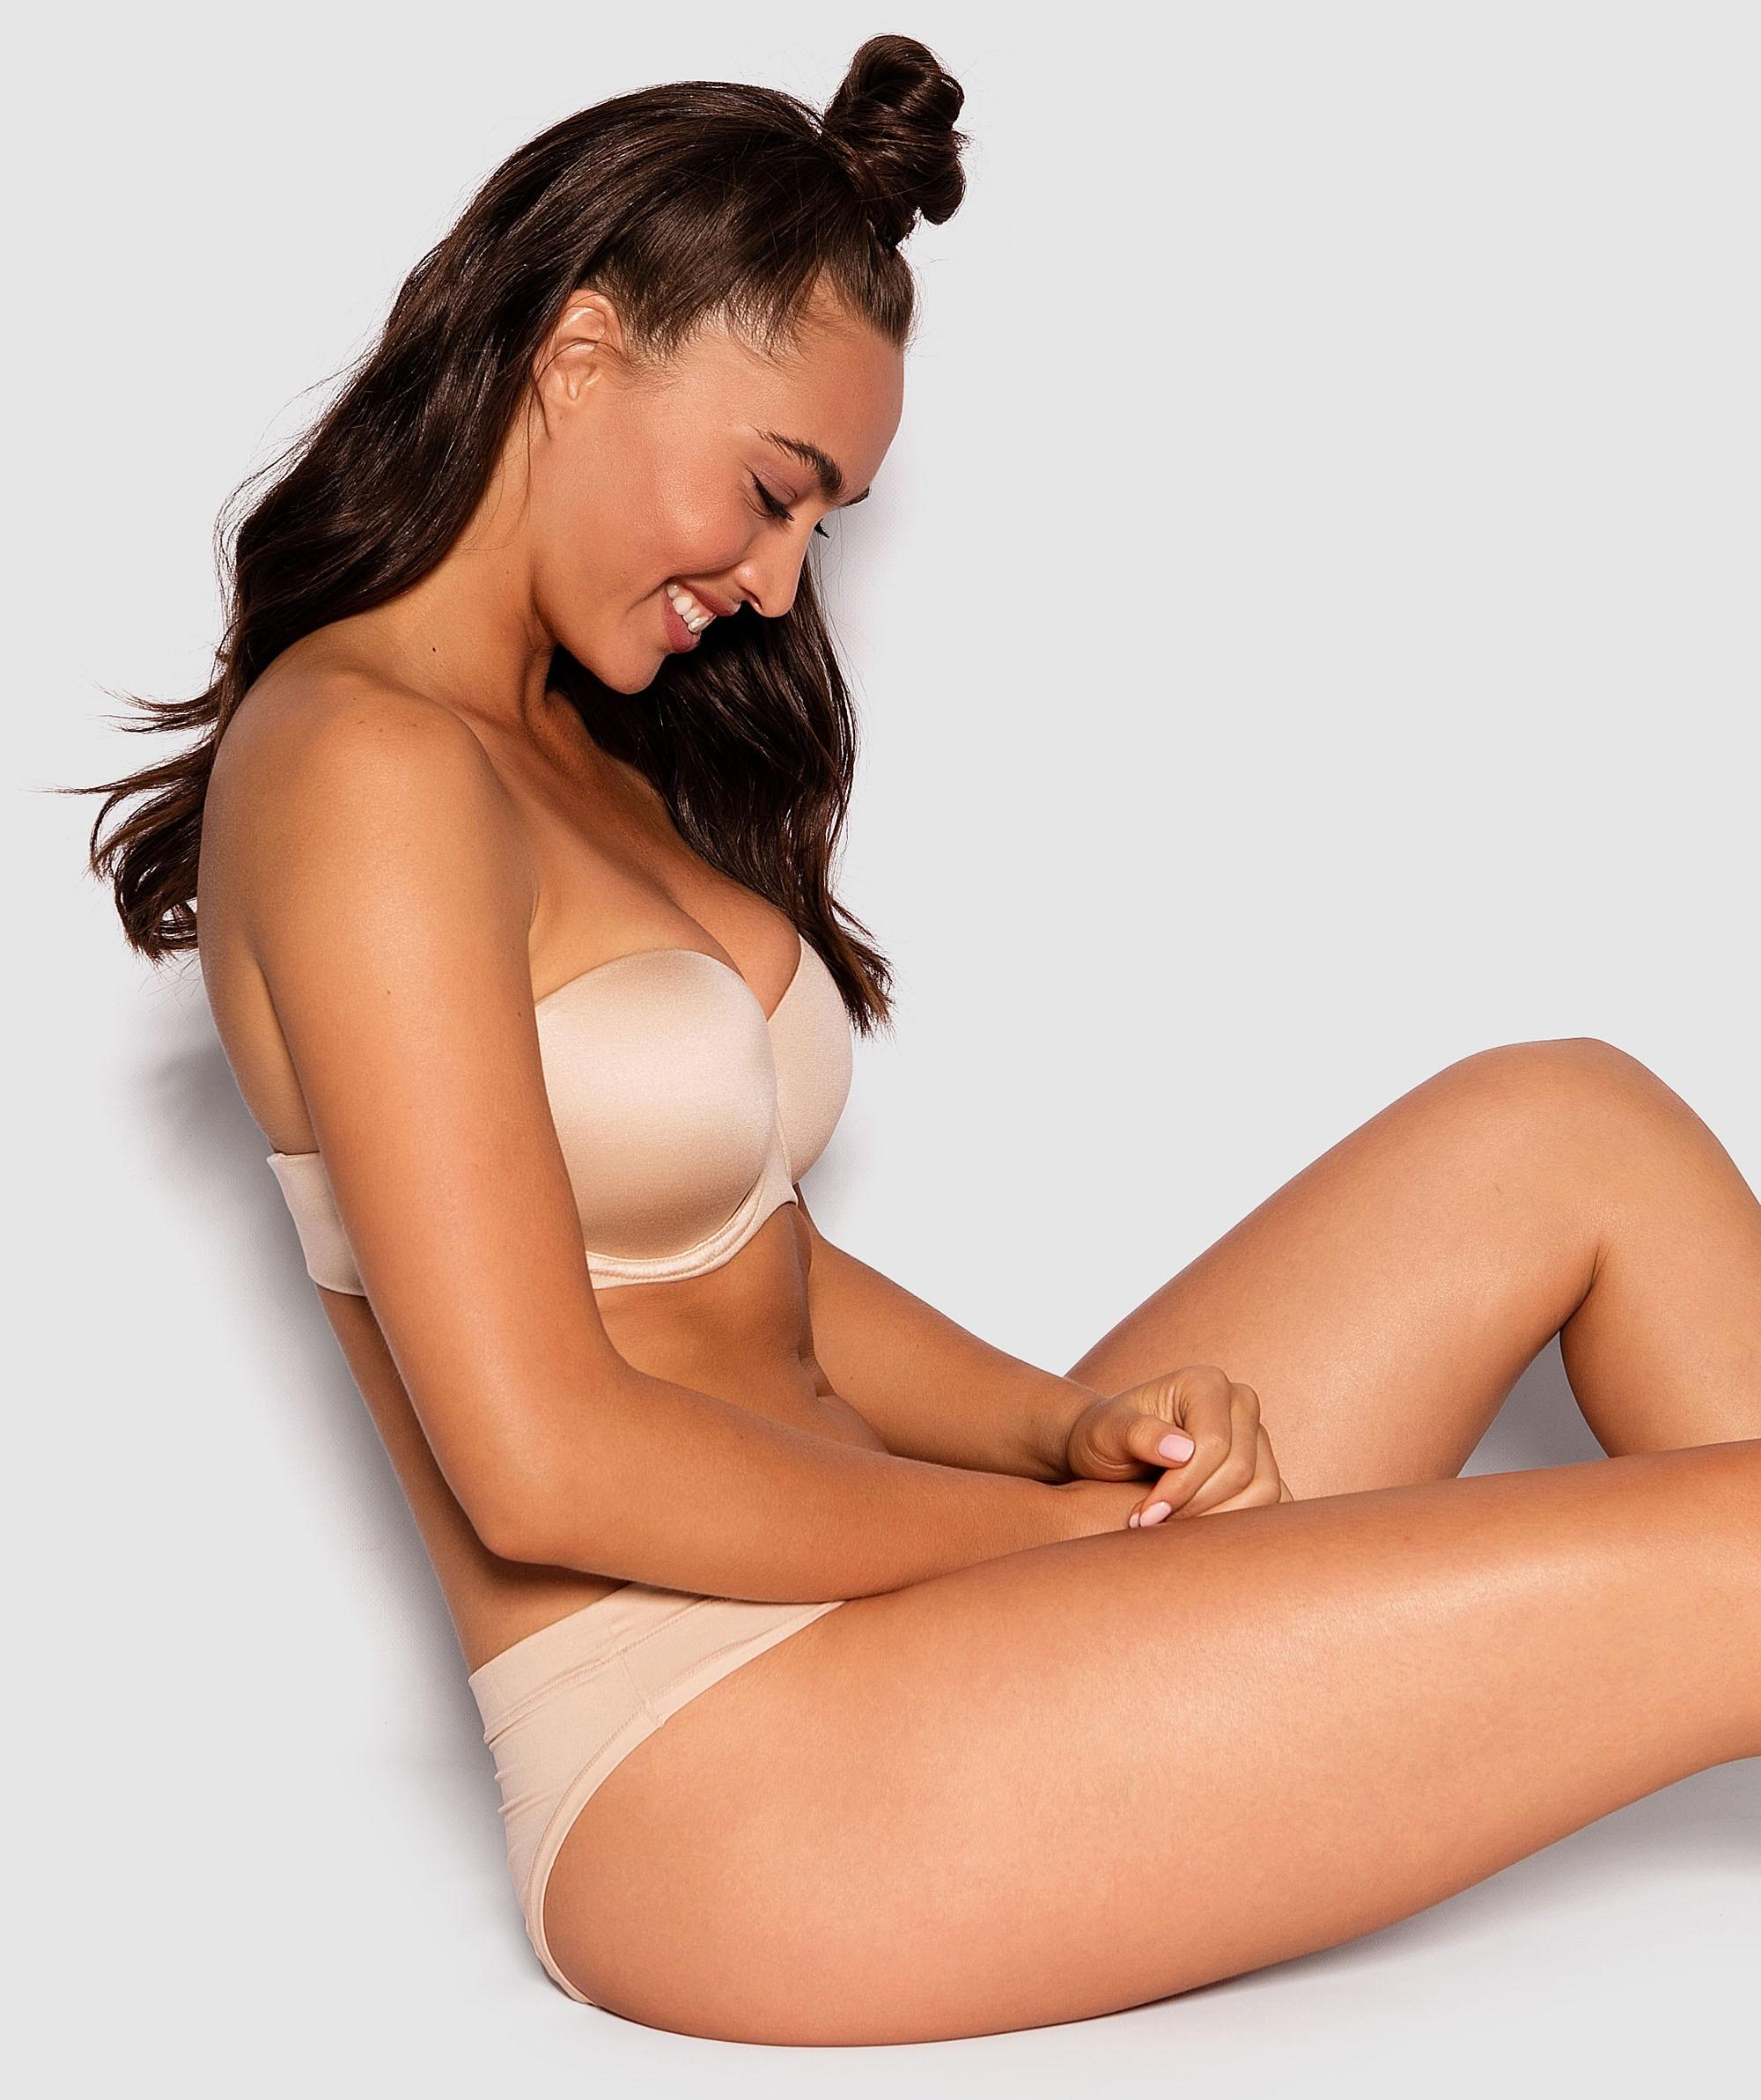 Body Bliss 2nd Gen Full Cup Strapless Bra - Nude